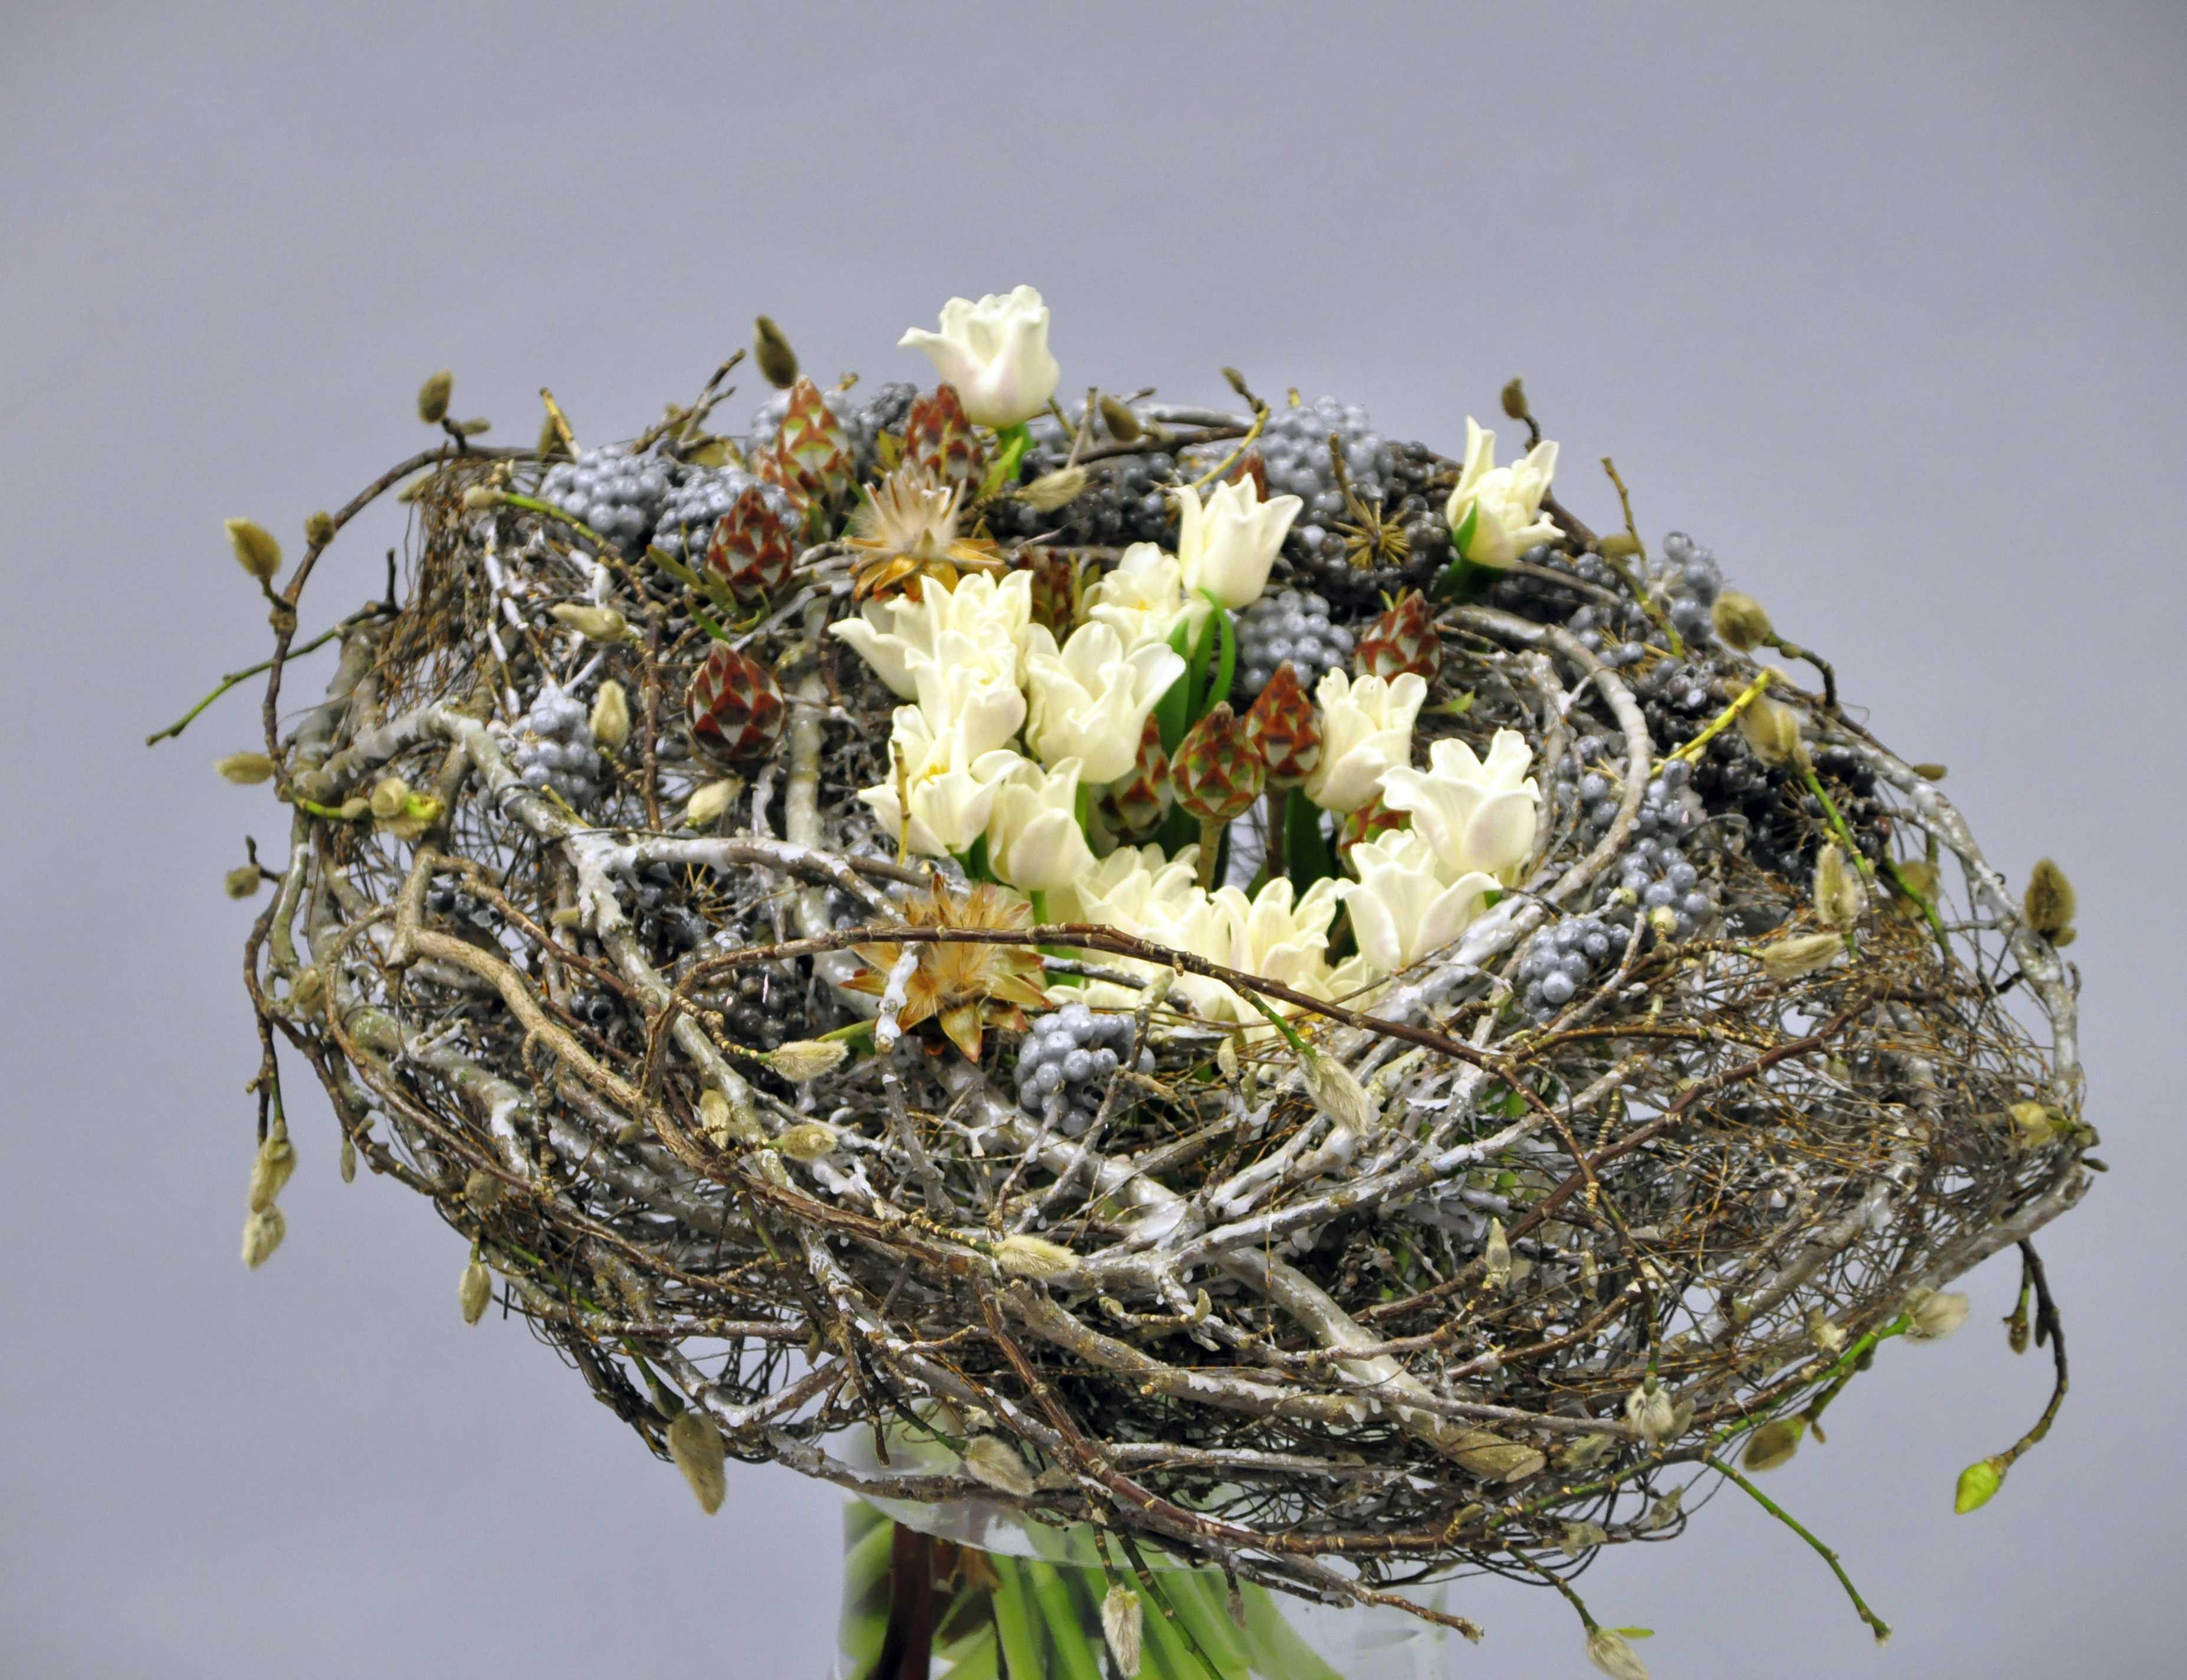 Németh Attila mester virágkötő bemutatója